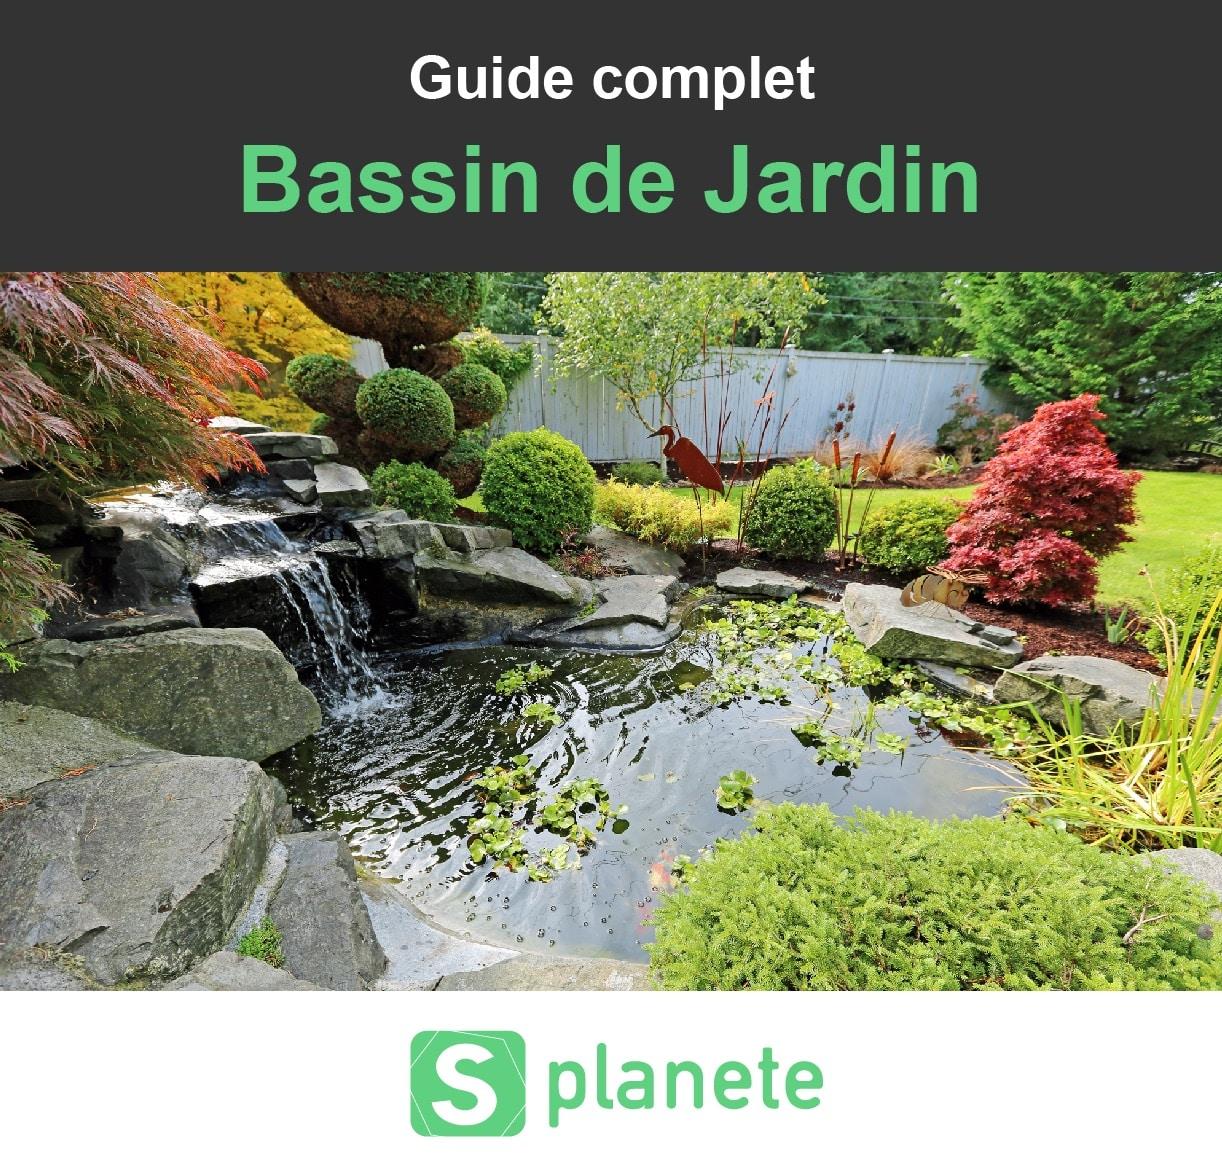 Bassin De Jardin : Construire, Aménager Et Entretenir ... avec Faire Un Bassin De Jardin